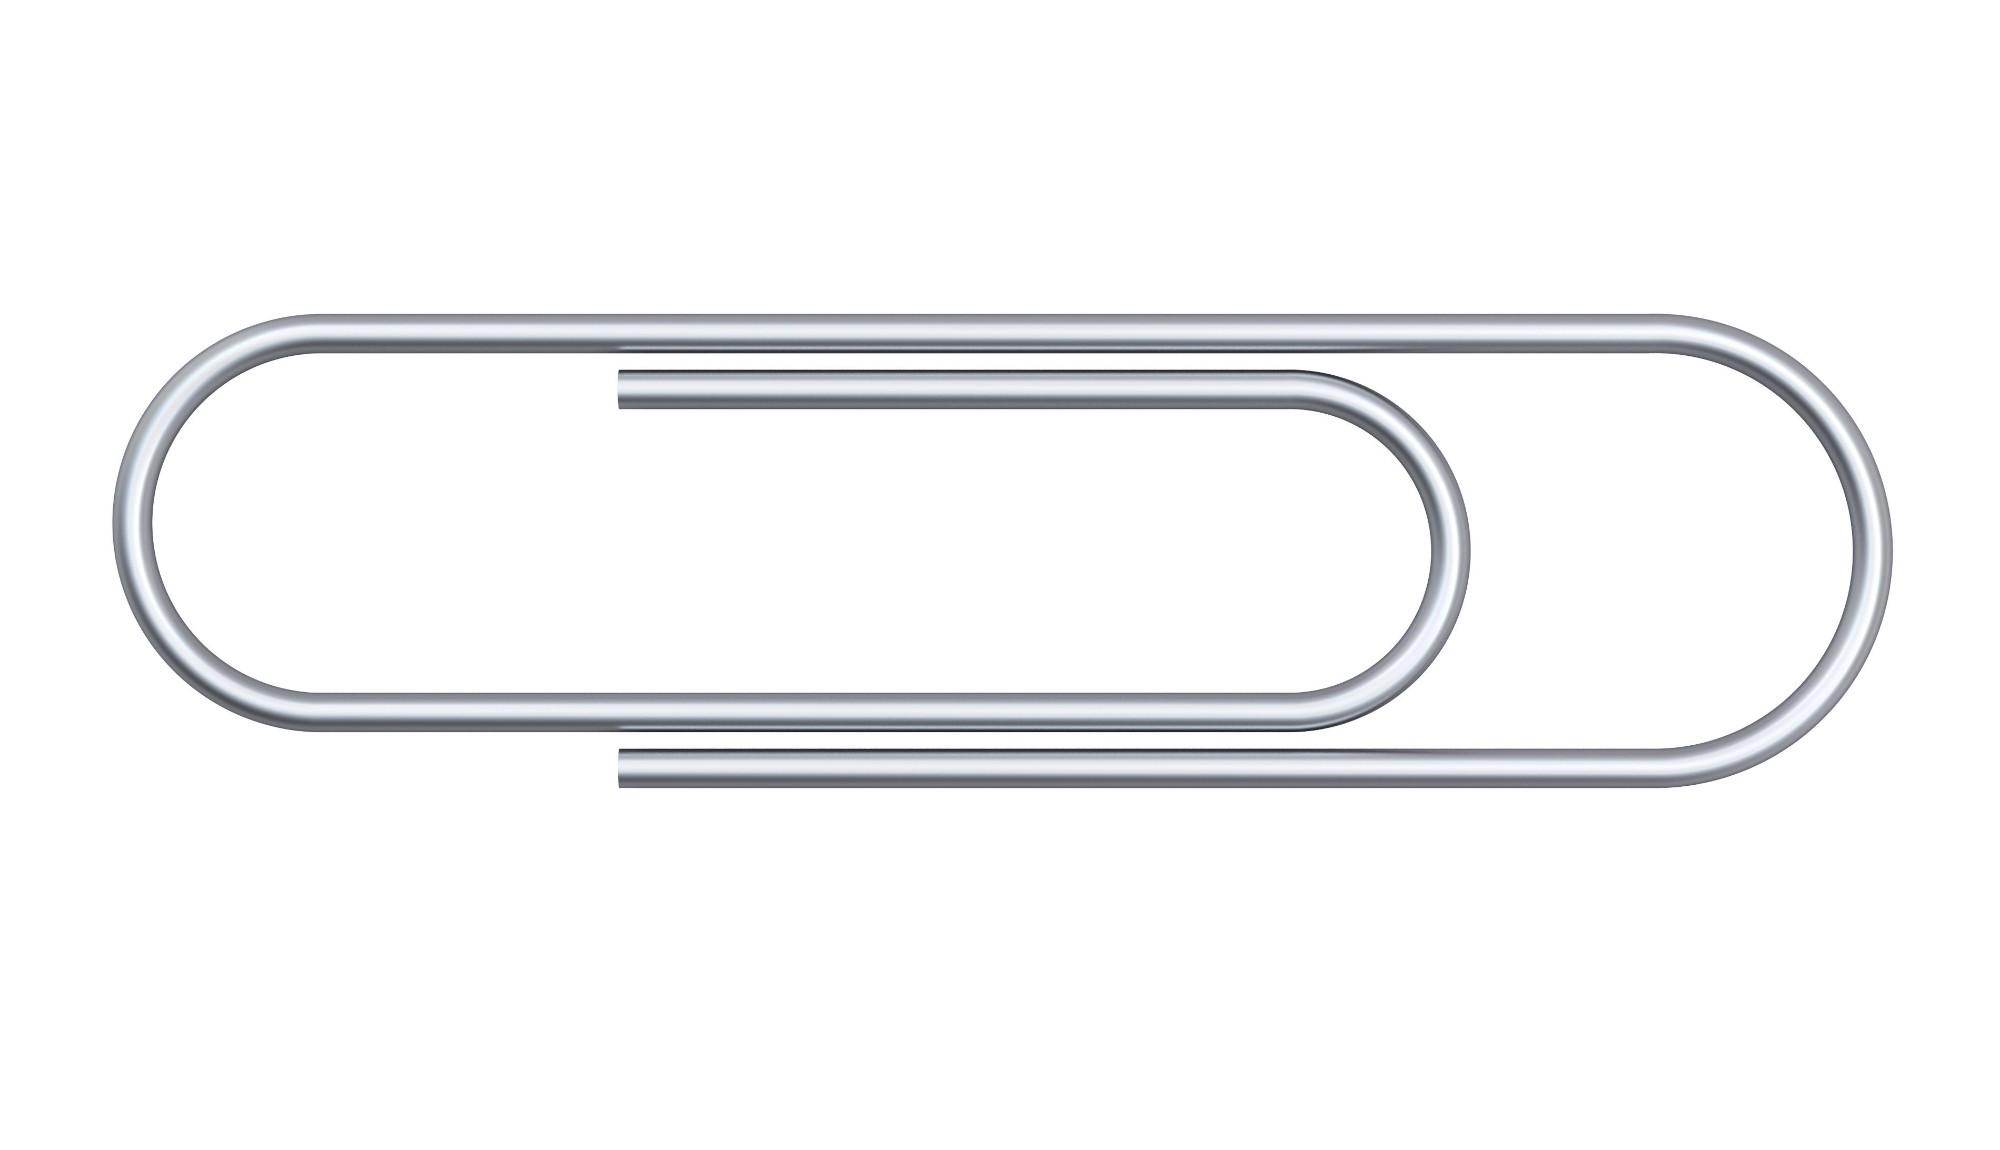 Whitecroft Essentials Value Paperclip Small Plain 22mm PK 1000